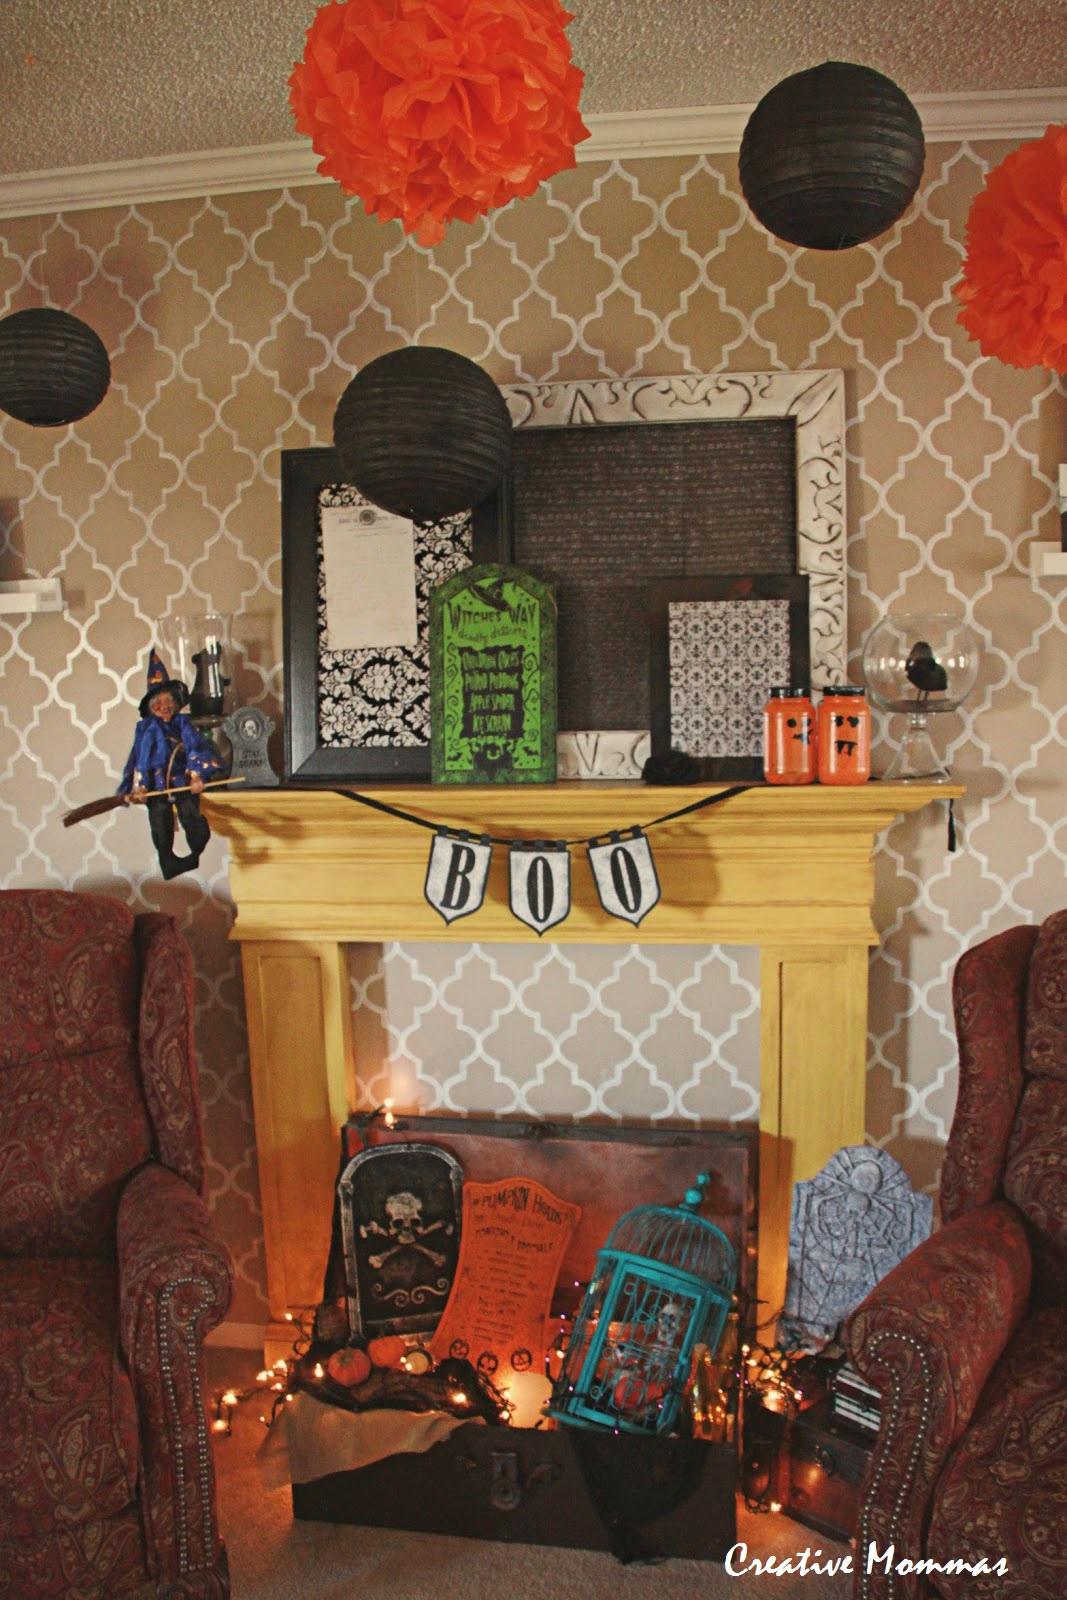 Creative mommas easy and inexpensive halloween decorations - Cheap and easy halloween decorations ...